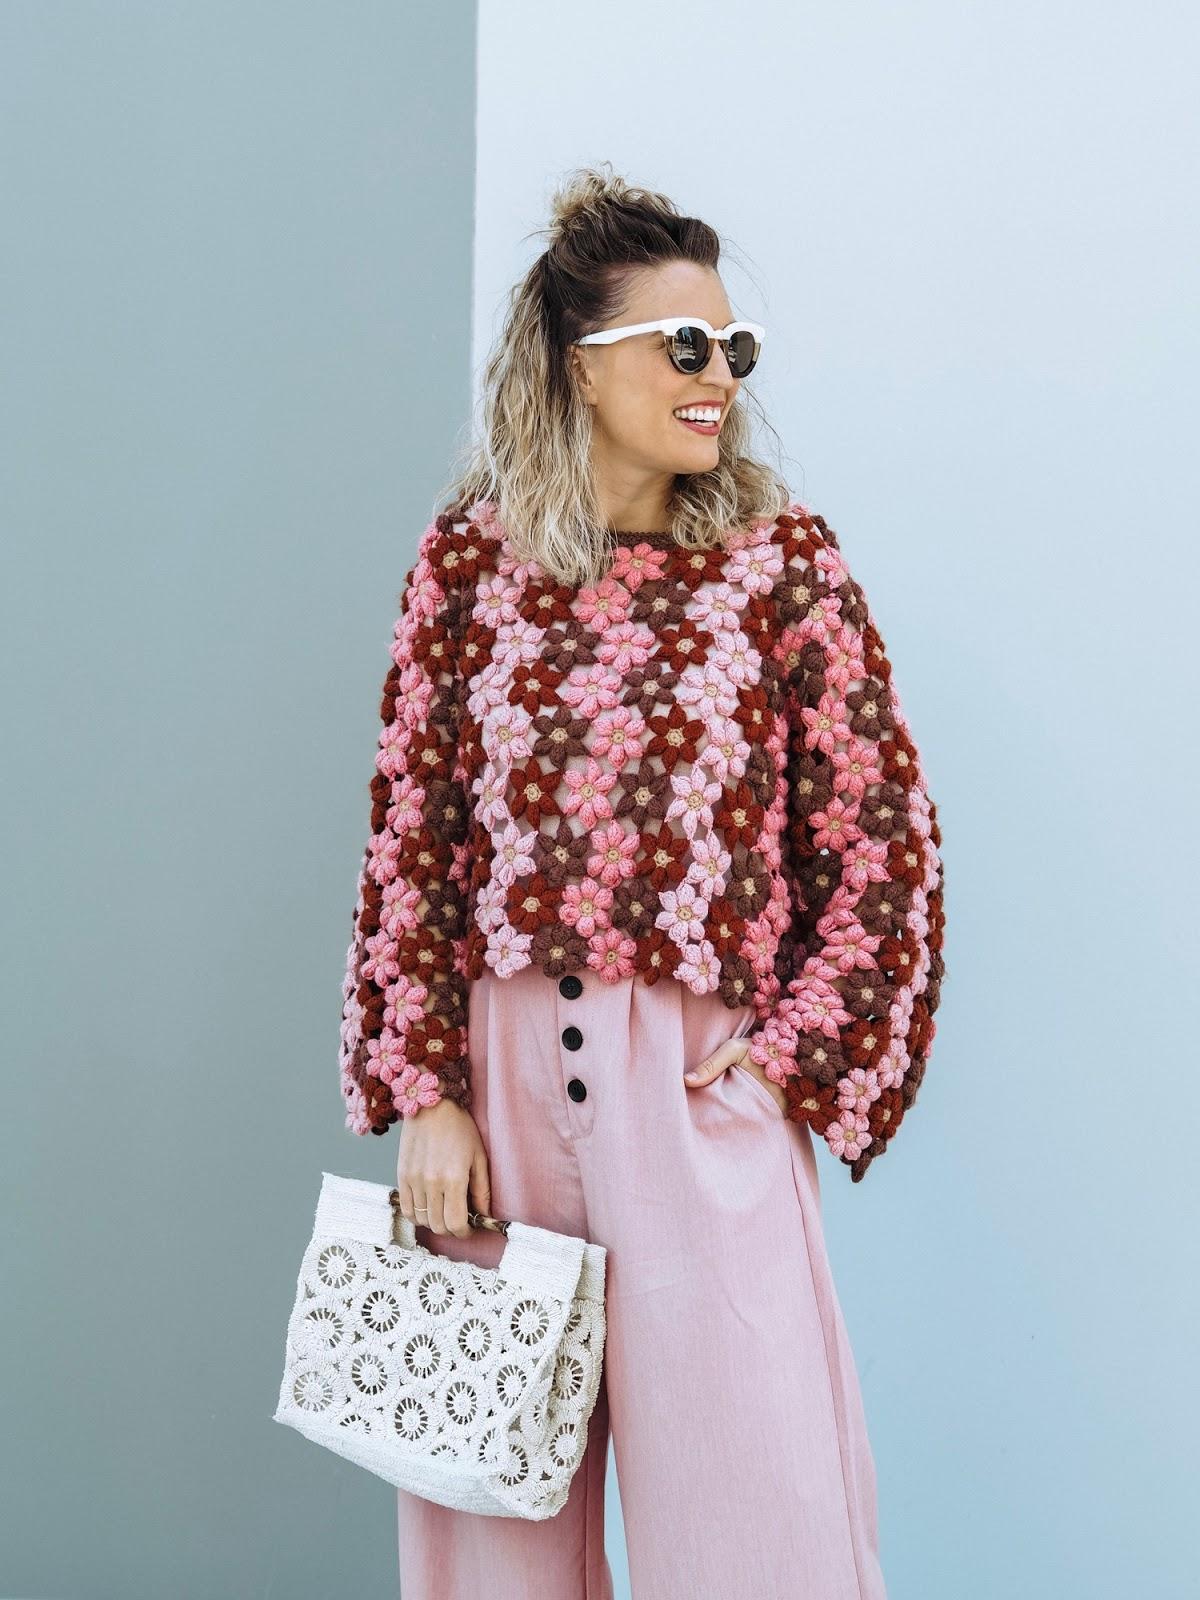 tendencia crochet verano 2020